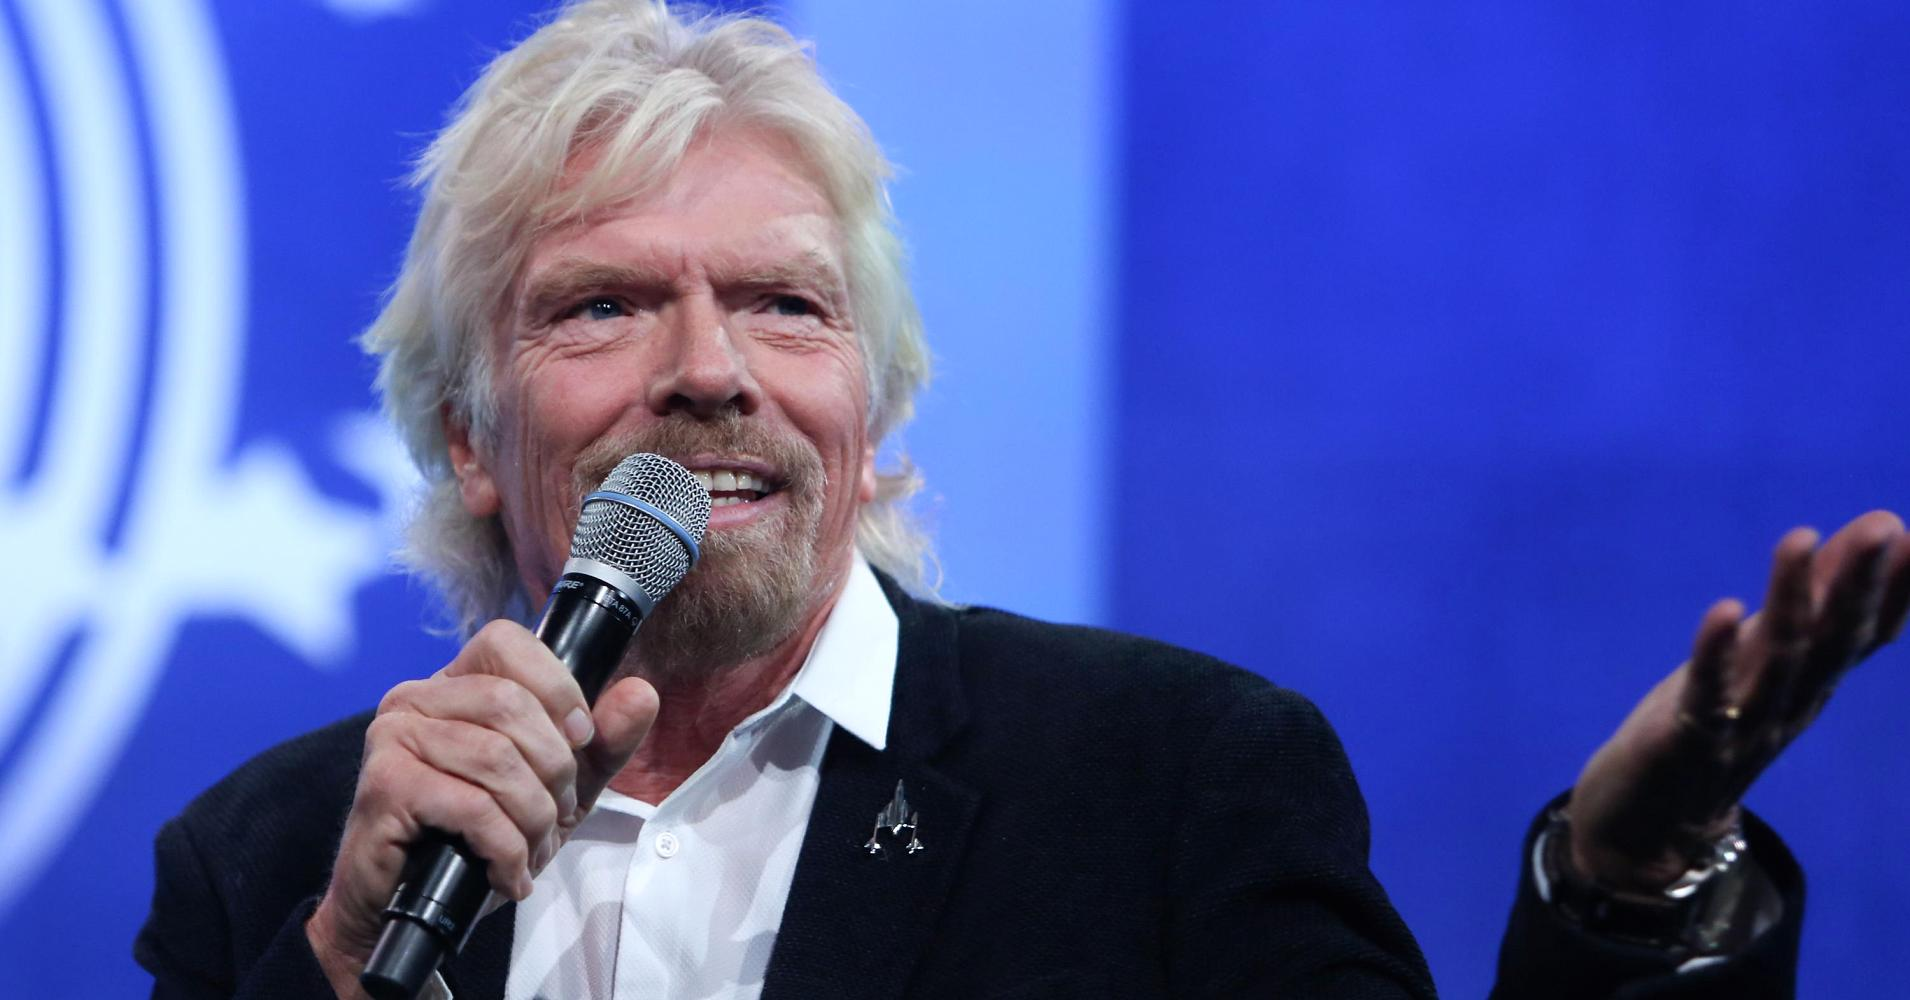 Richard Branson, billionaire business magnate